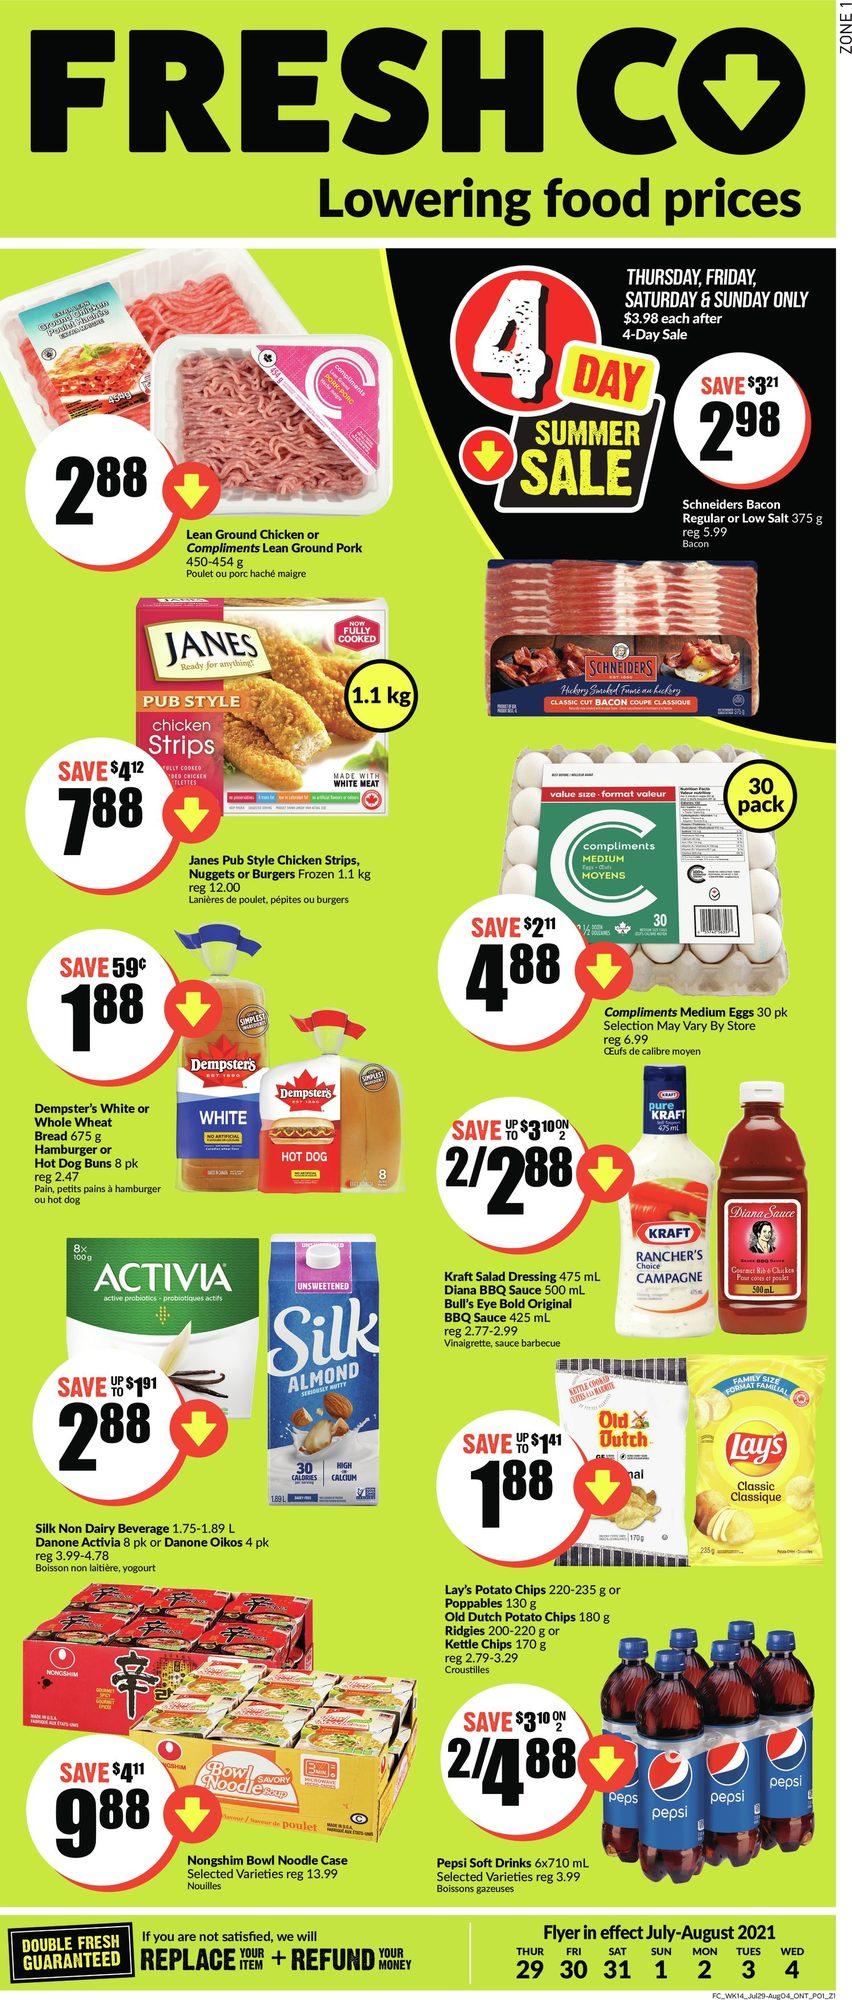 FreshCo - Weekly Flyer Specials